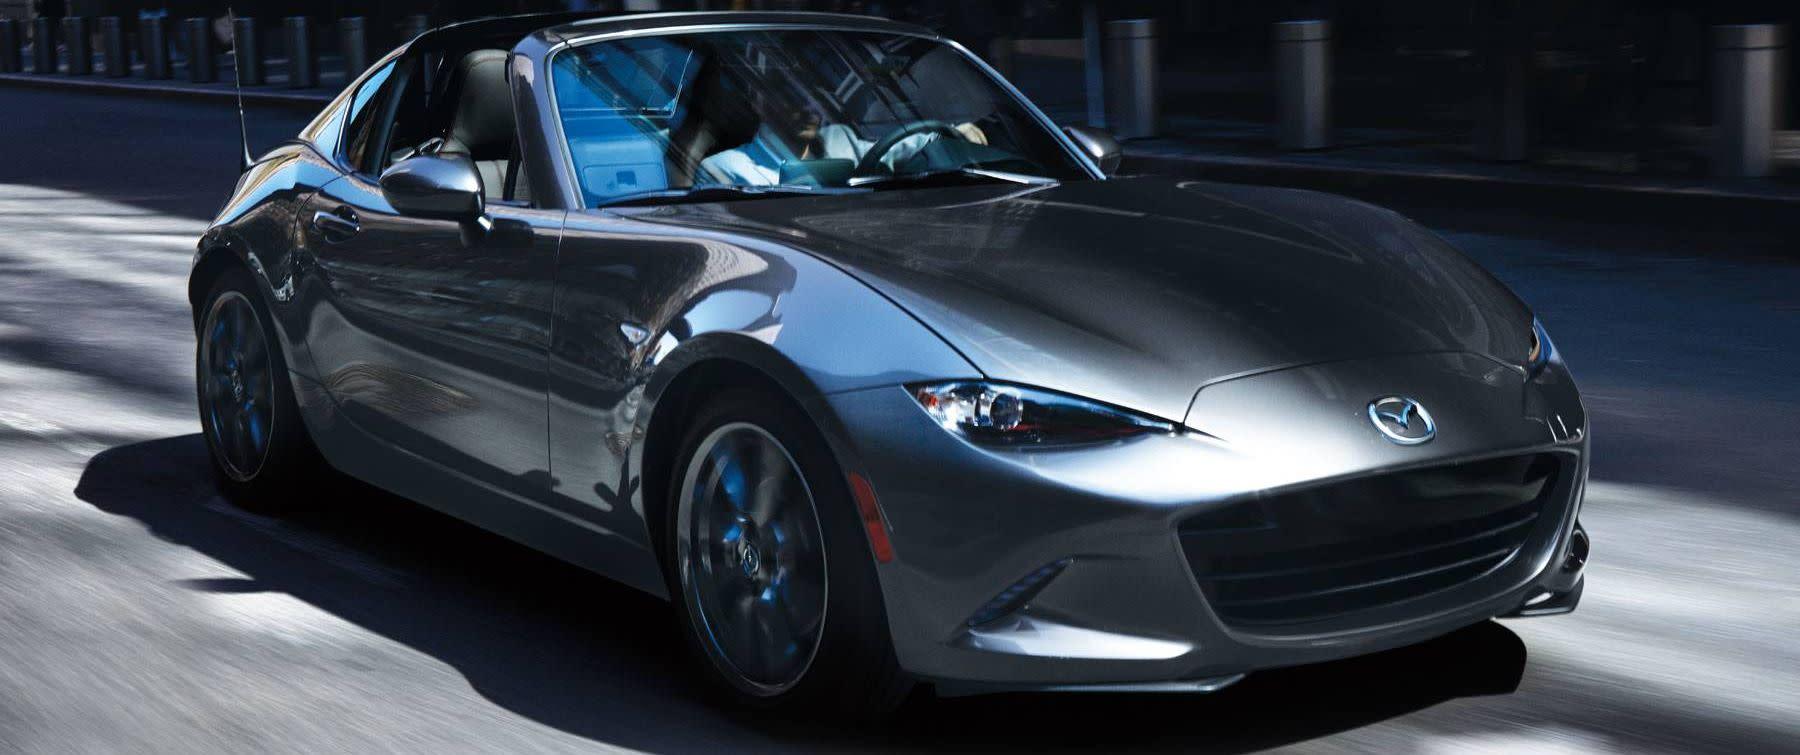 2018 Mazda MX-5 Miata RF Financing in Sacramento, CA